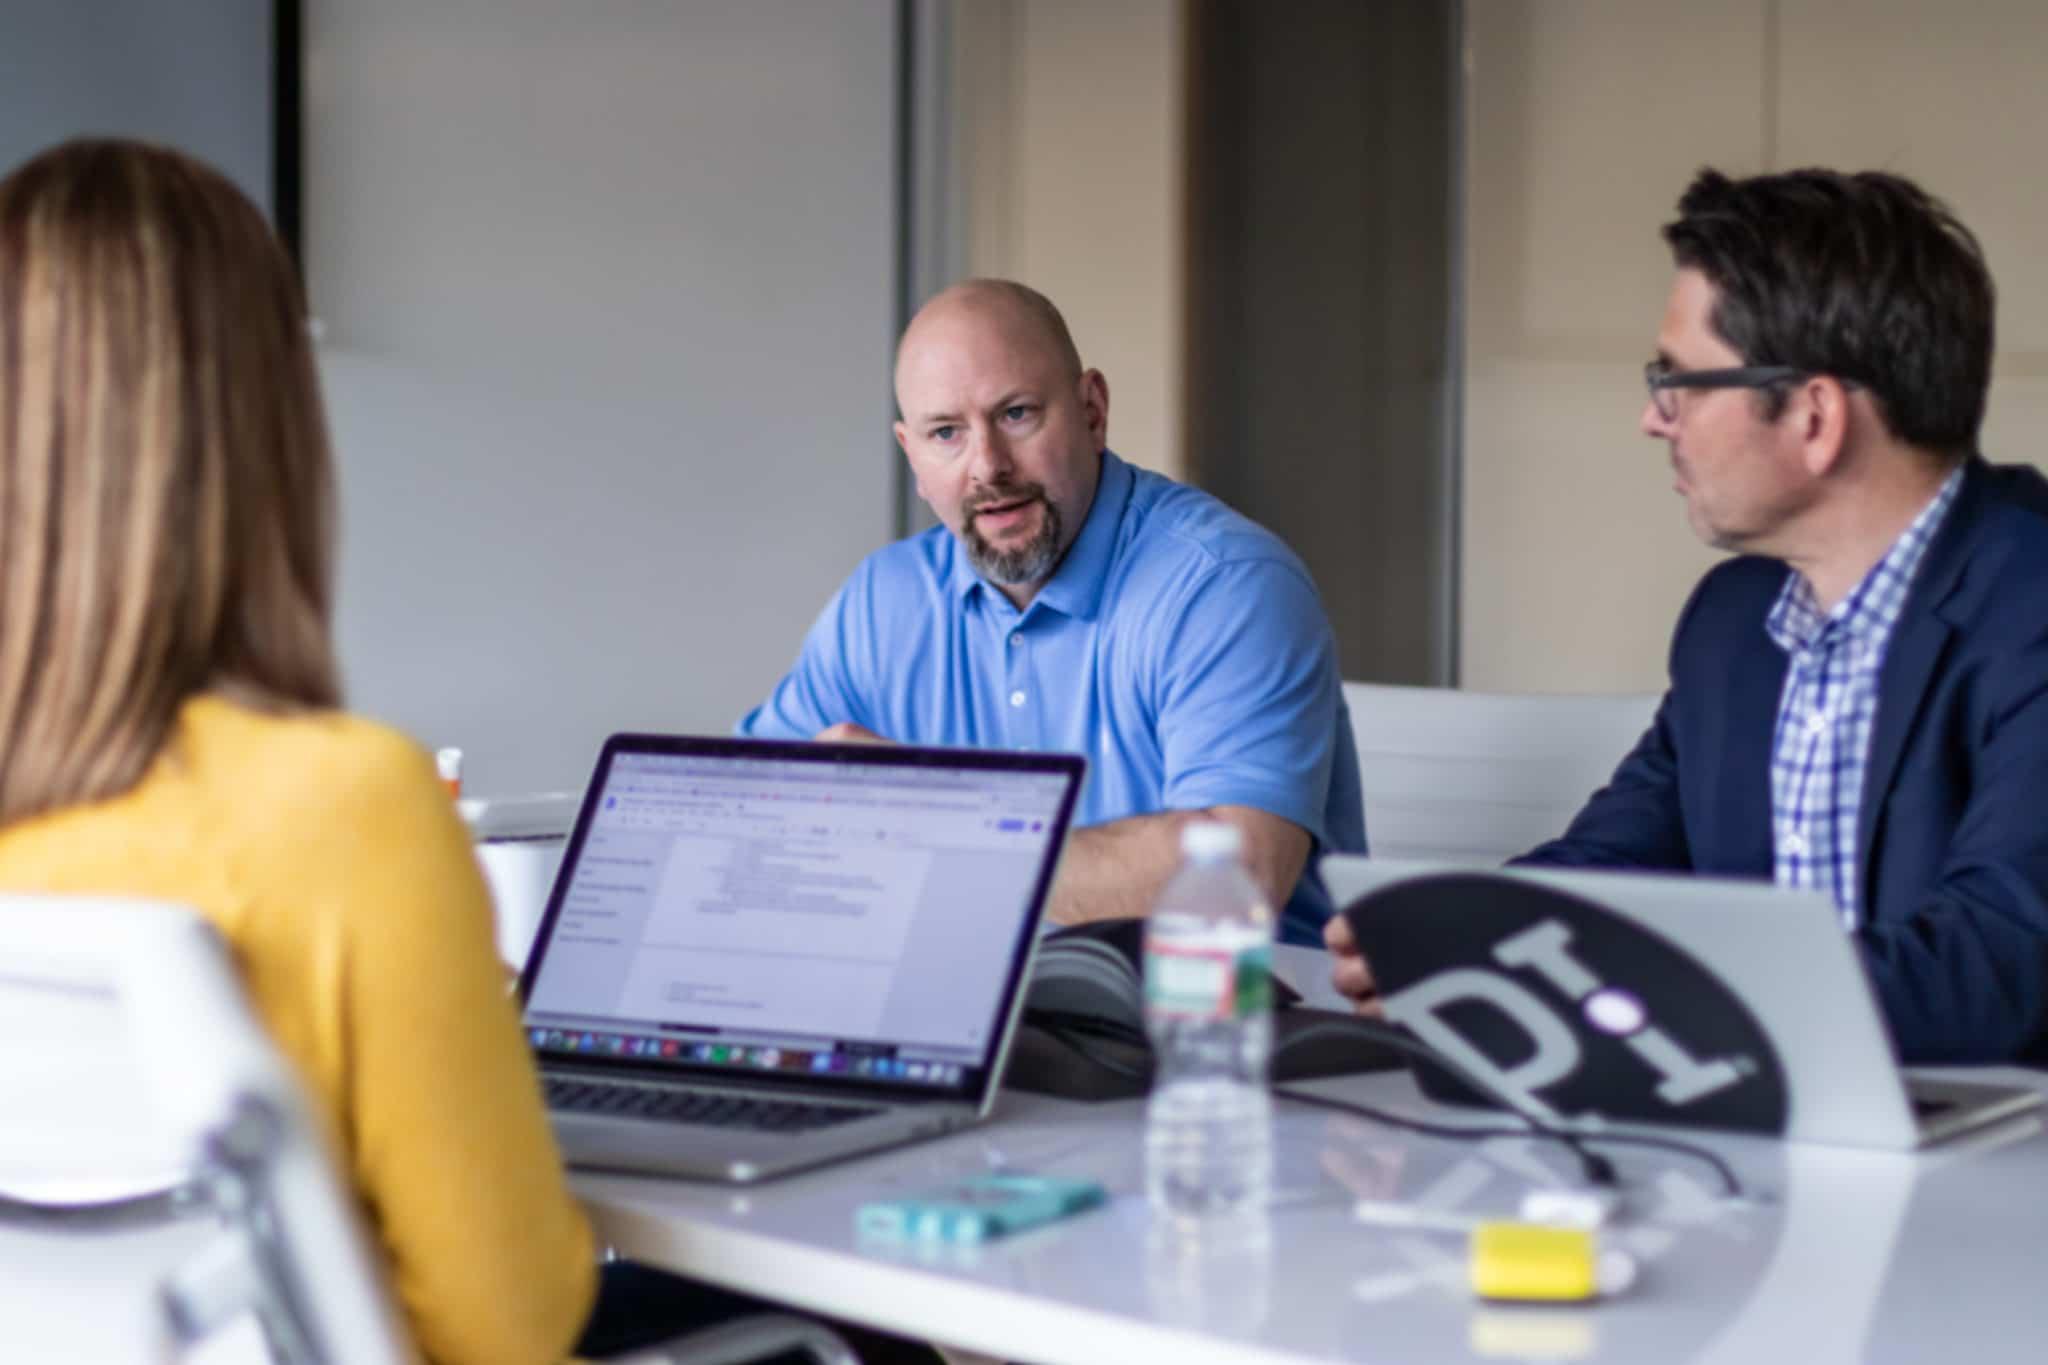 Disagreement among the executive team